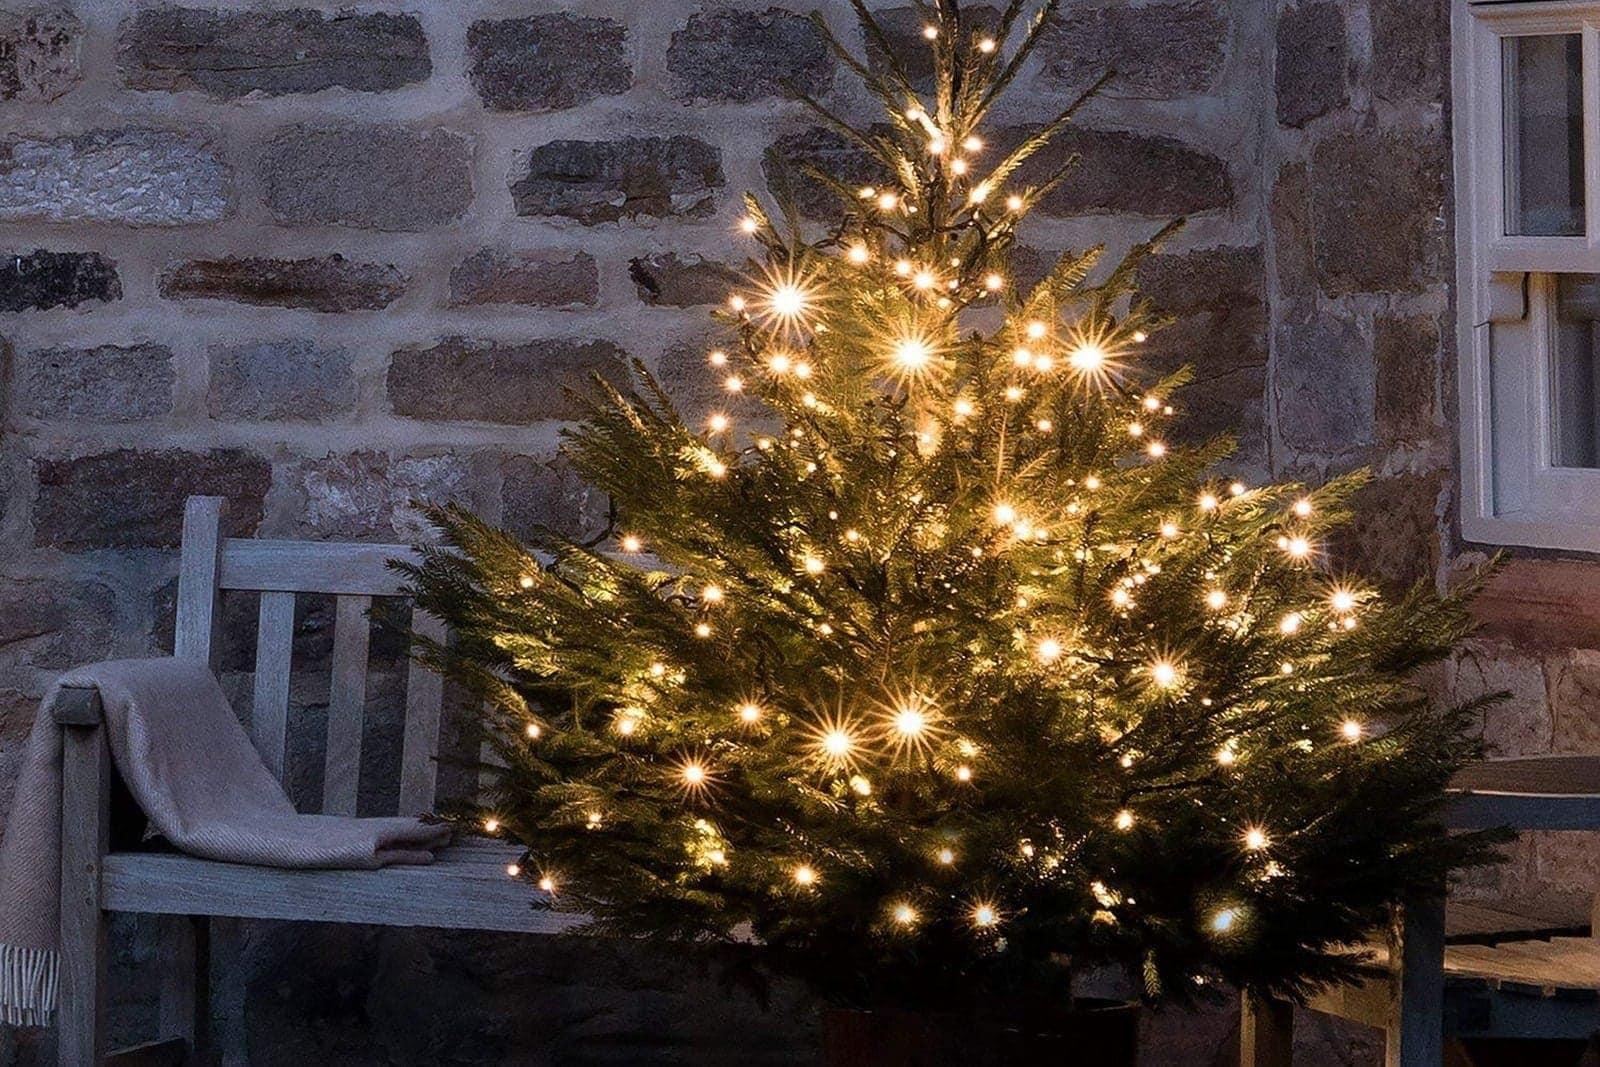 Kerstverlichting Led Wit Snoer Warm Wit 240 Lampjes